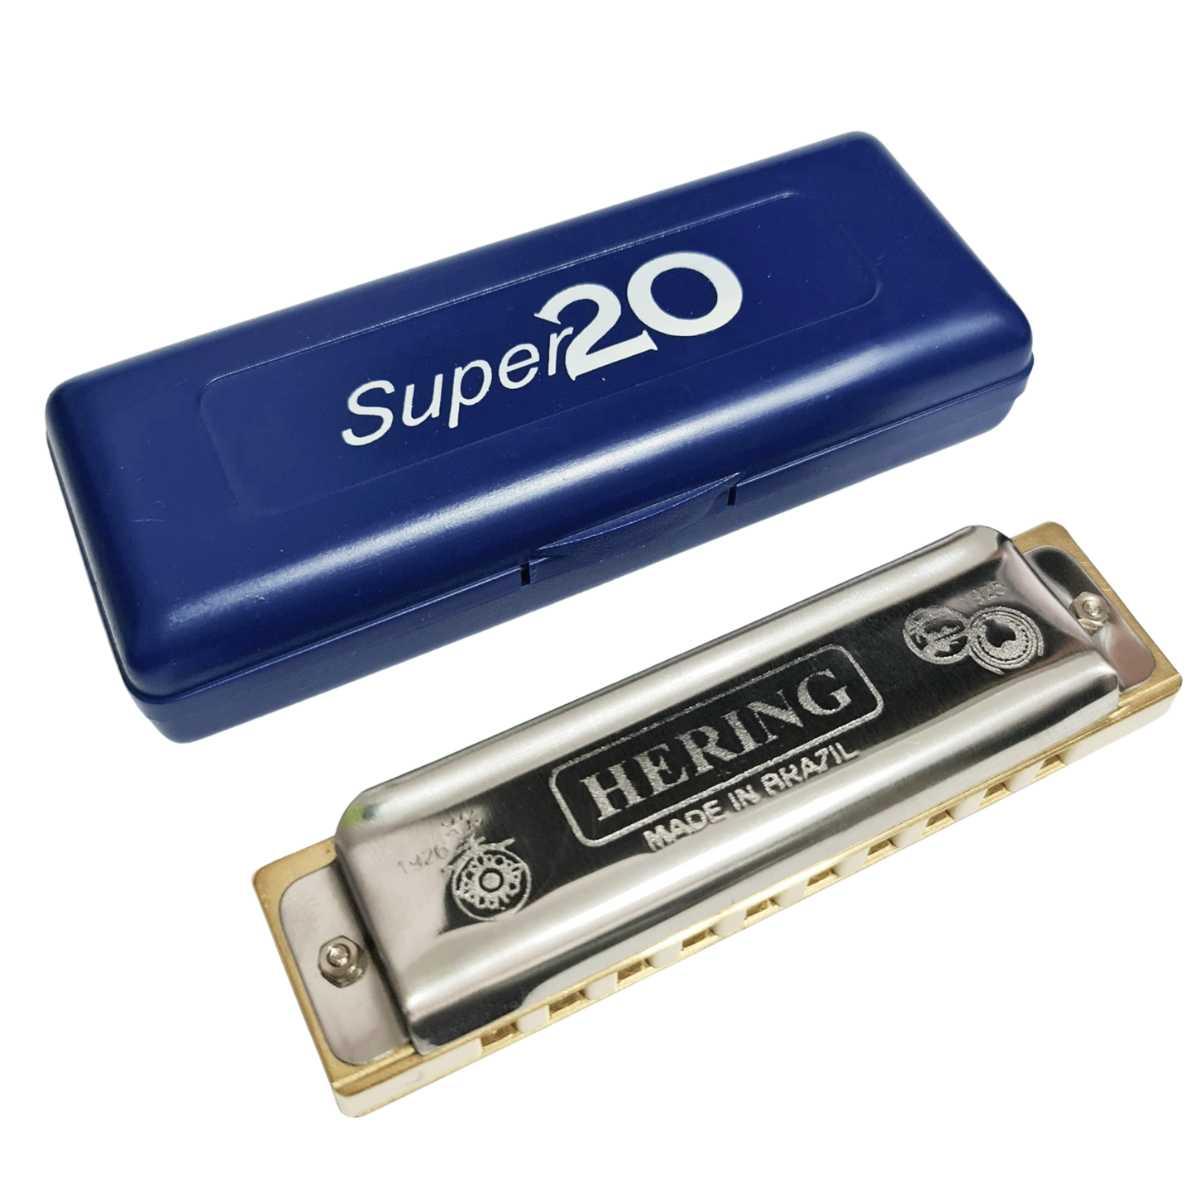 Gaita Hering Profissional Boca Super 20 RÉ 8020D Com Estojo